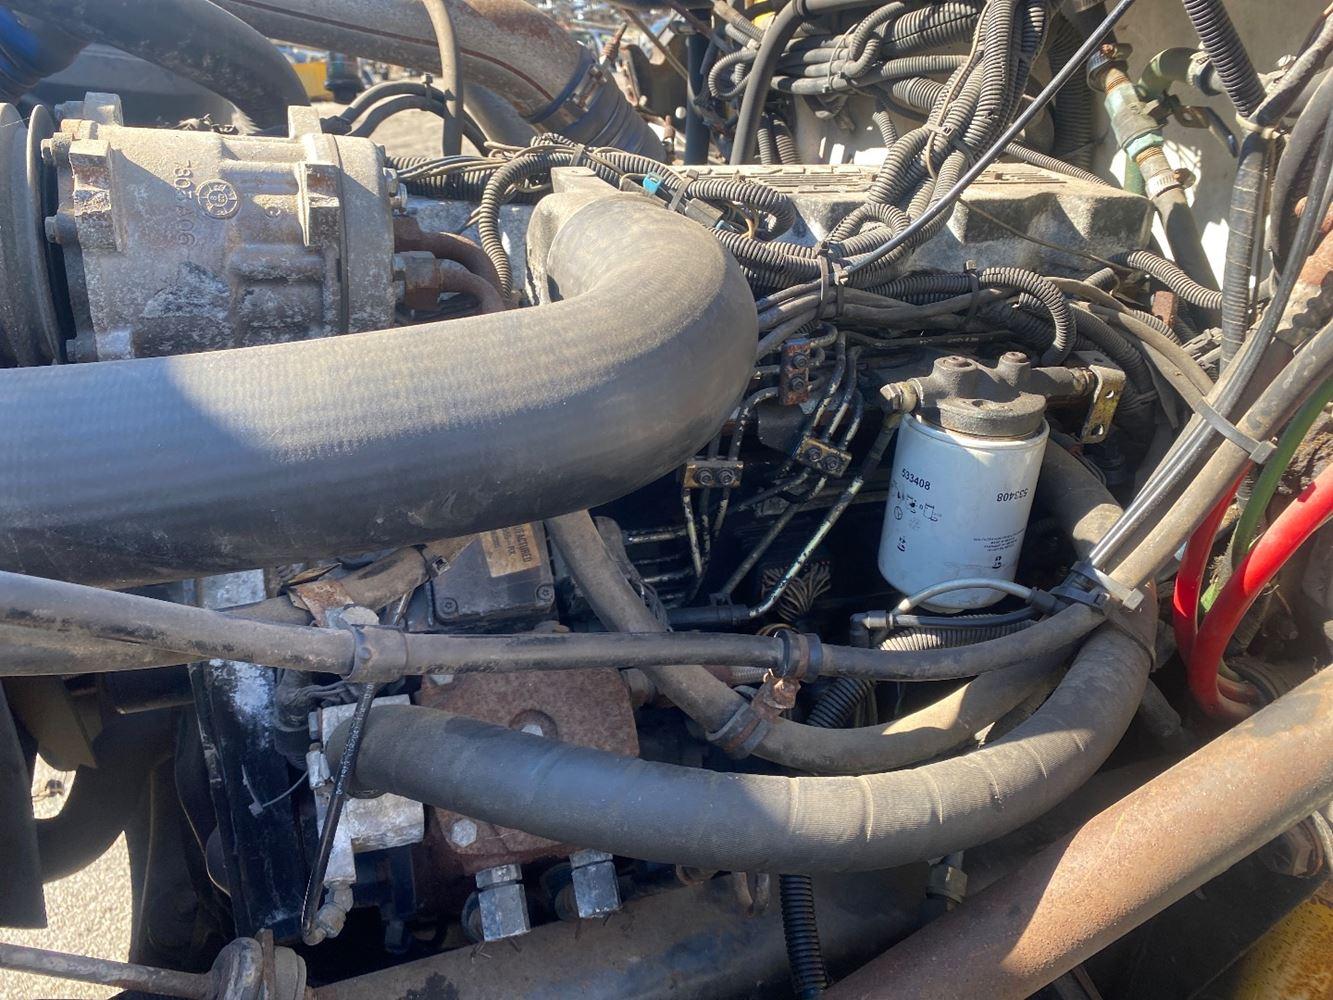 2000 CUMMINS ISB 260 ENGINE ASSEMBLY TRUCK PARTS #707531